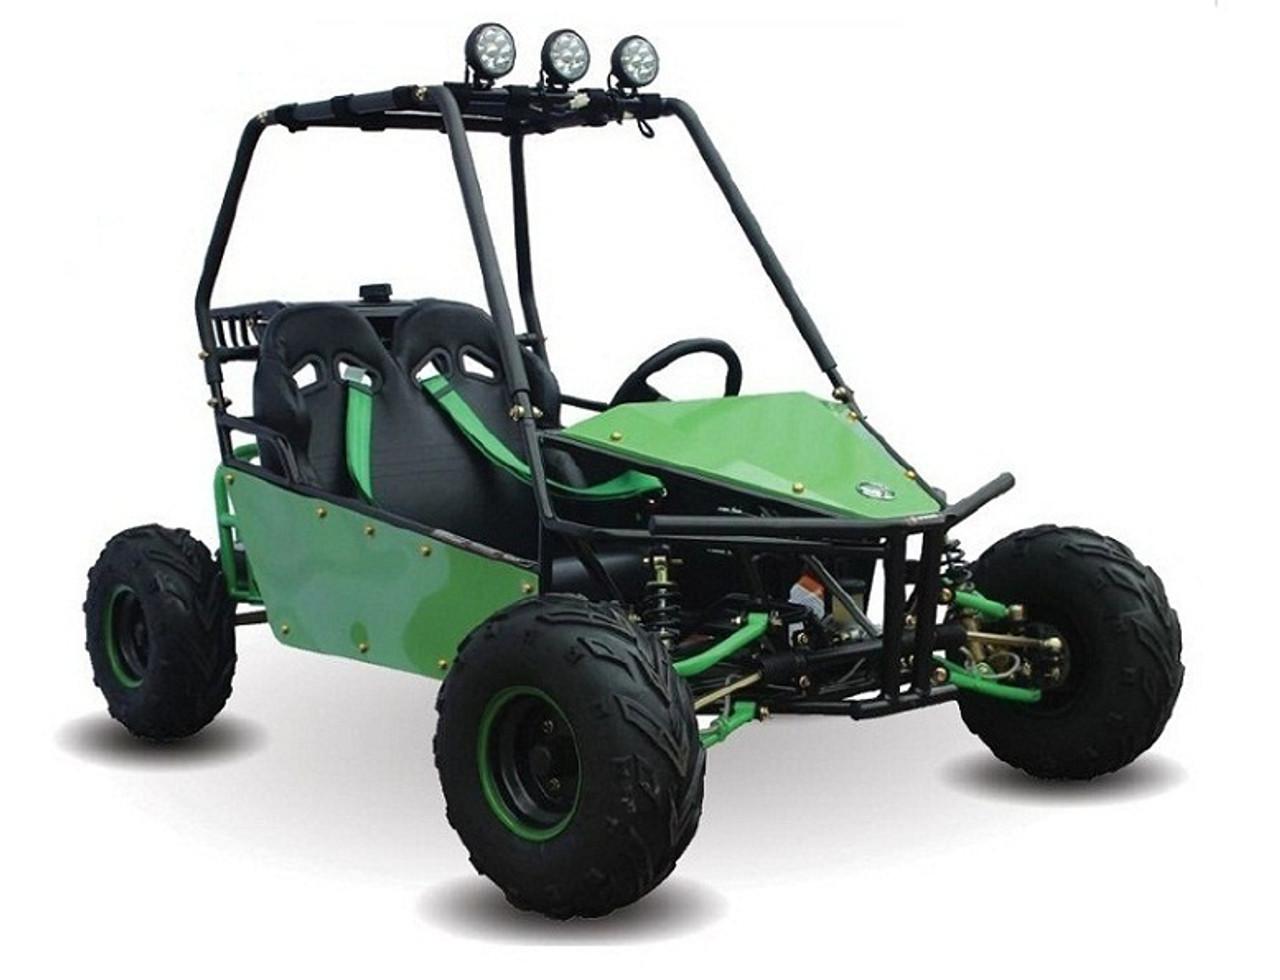 2018 KANDI KD-125GKM 125CC 2-SEAT OFF-ROAD GAS GO KART